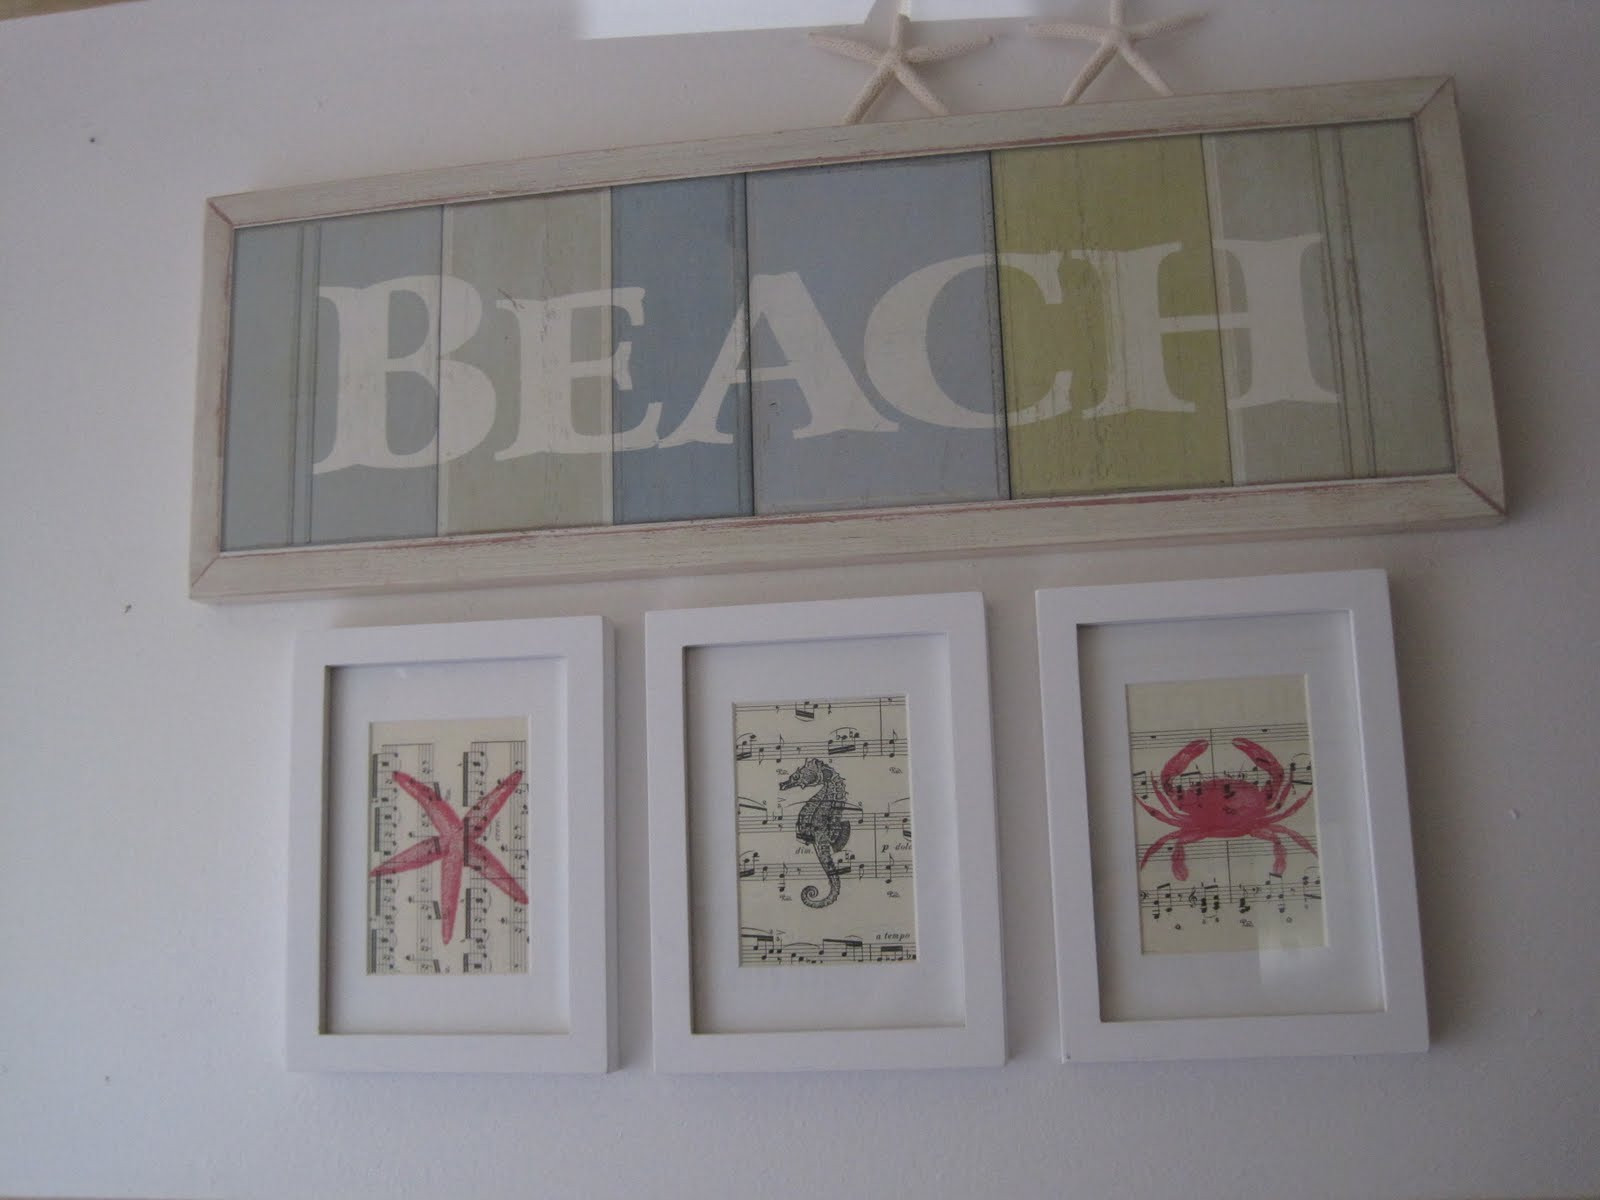 Best ideas about Beach Wall Art . Save or Pin Beach Creatures Wall Art Okio B Designs Now.